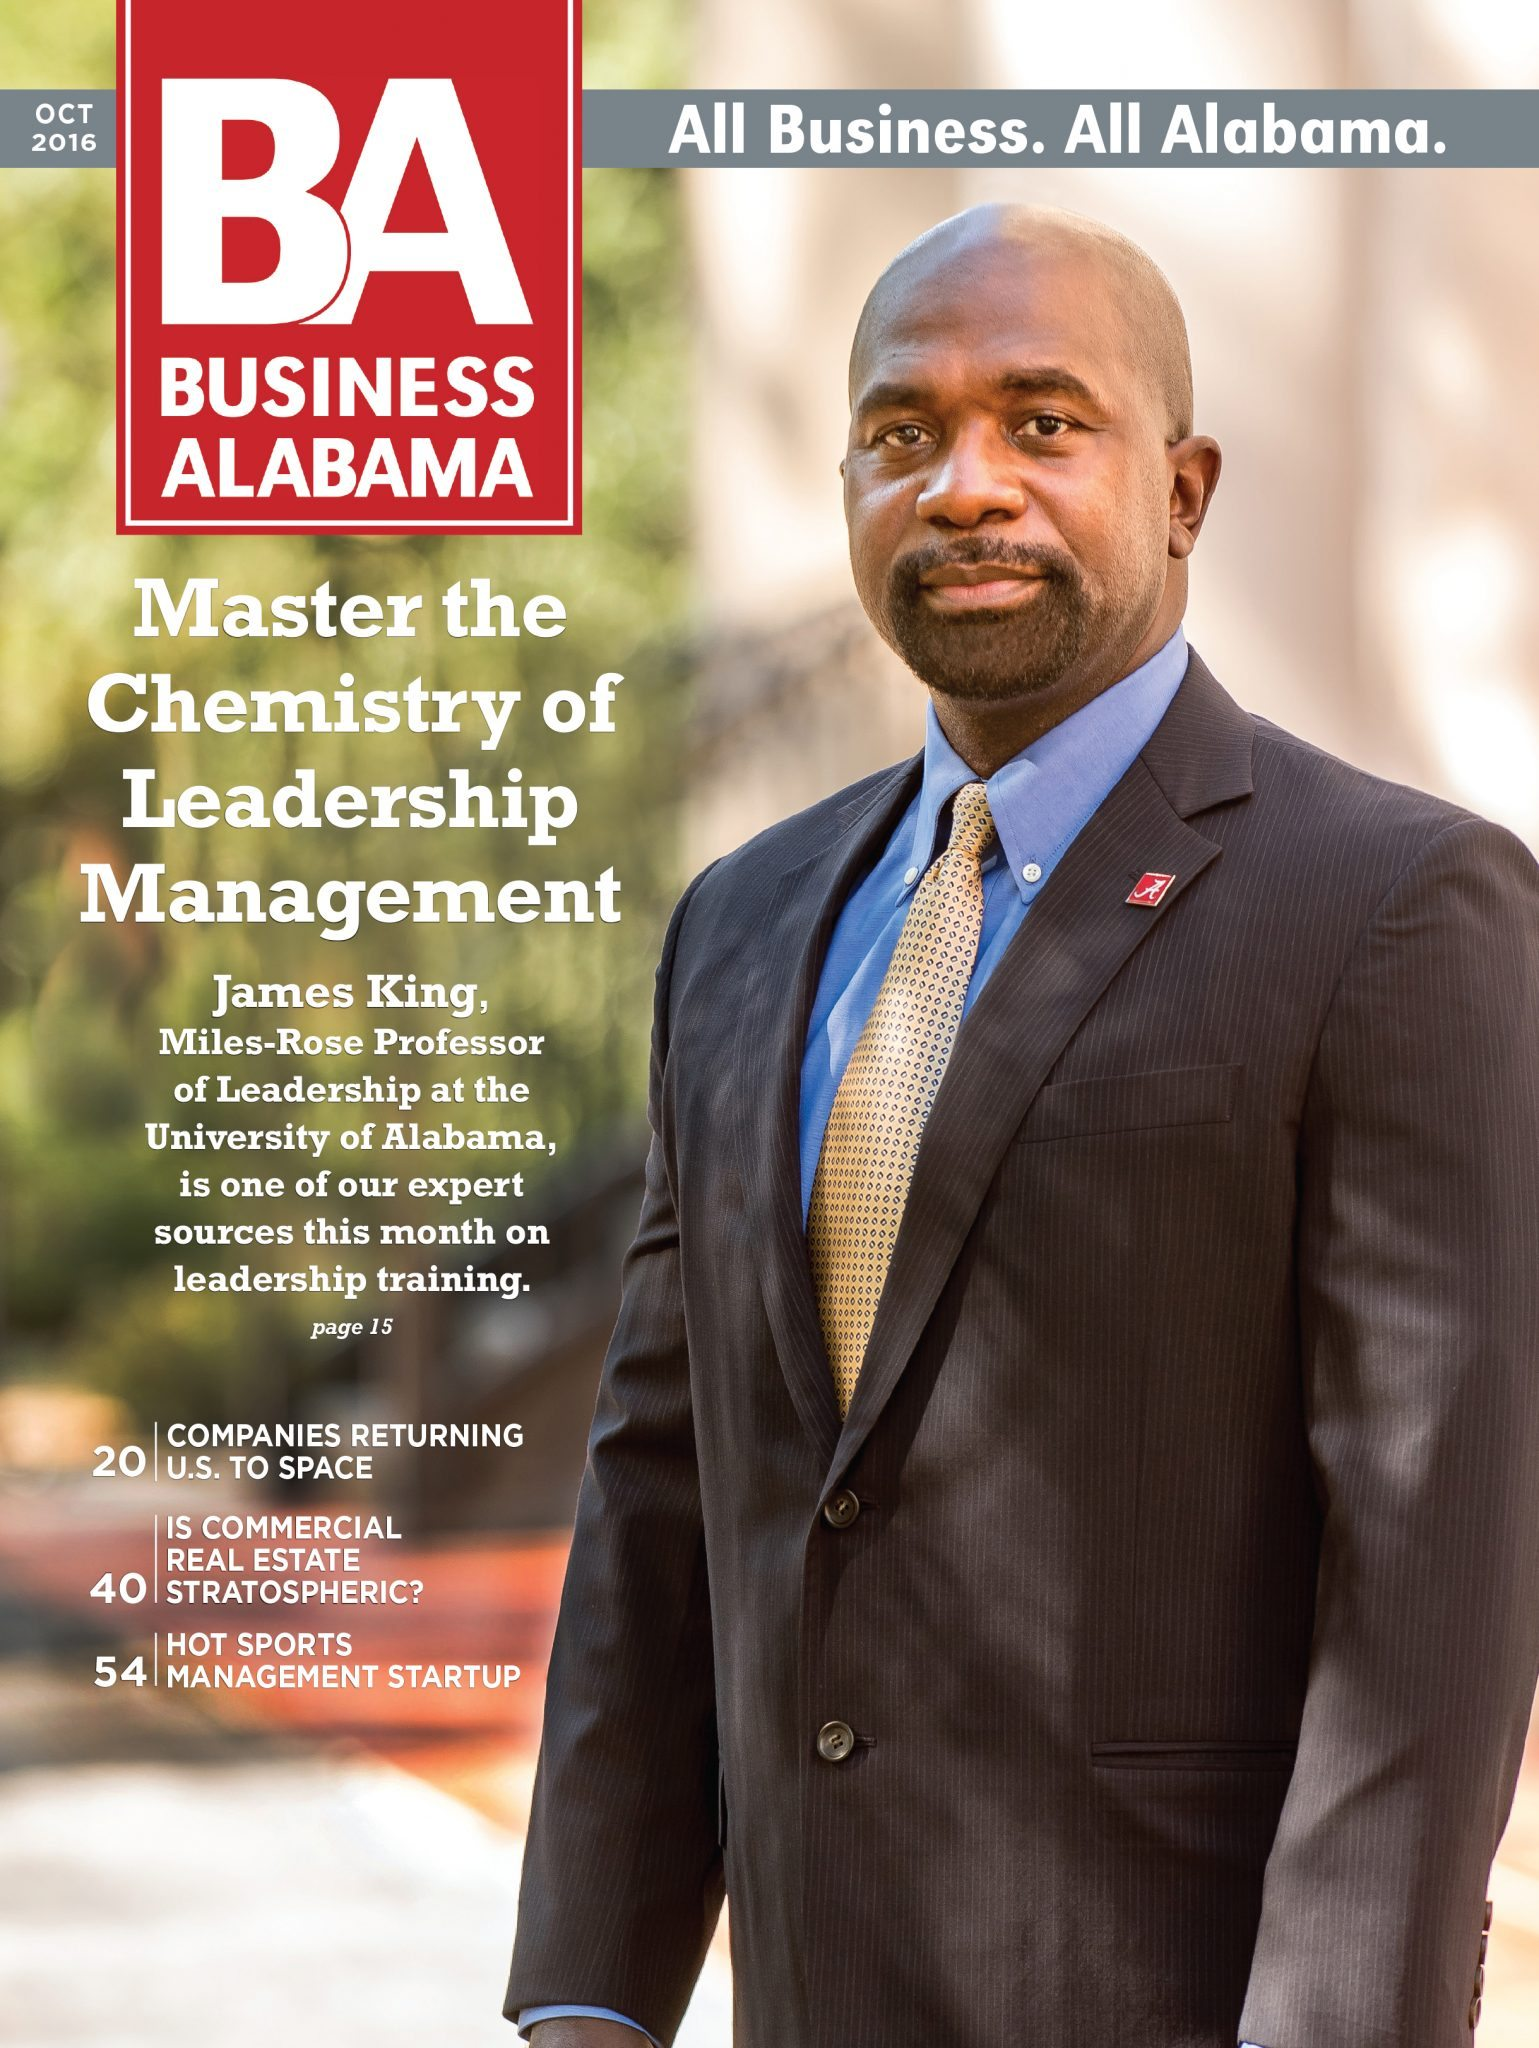 Bus Alabama Magazine October 2016